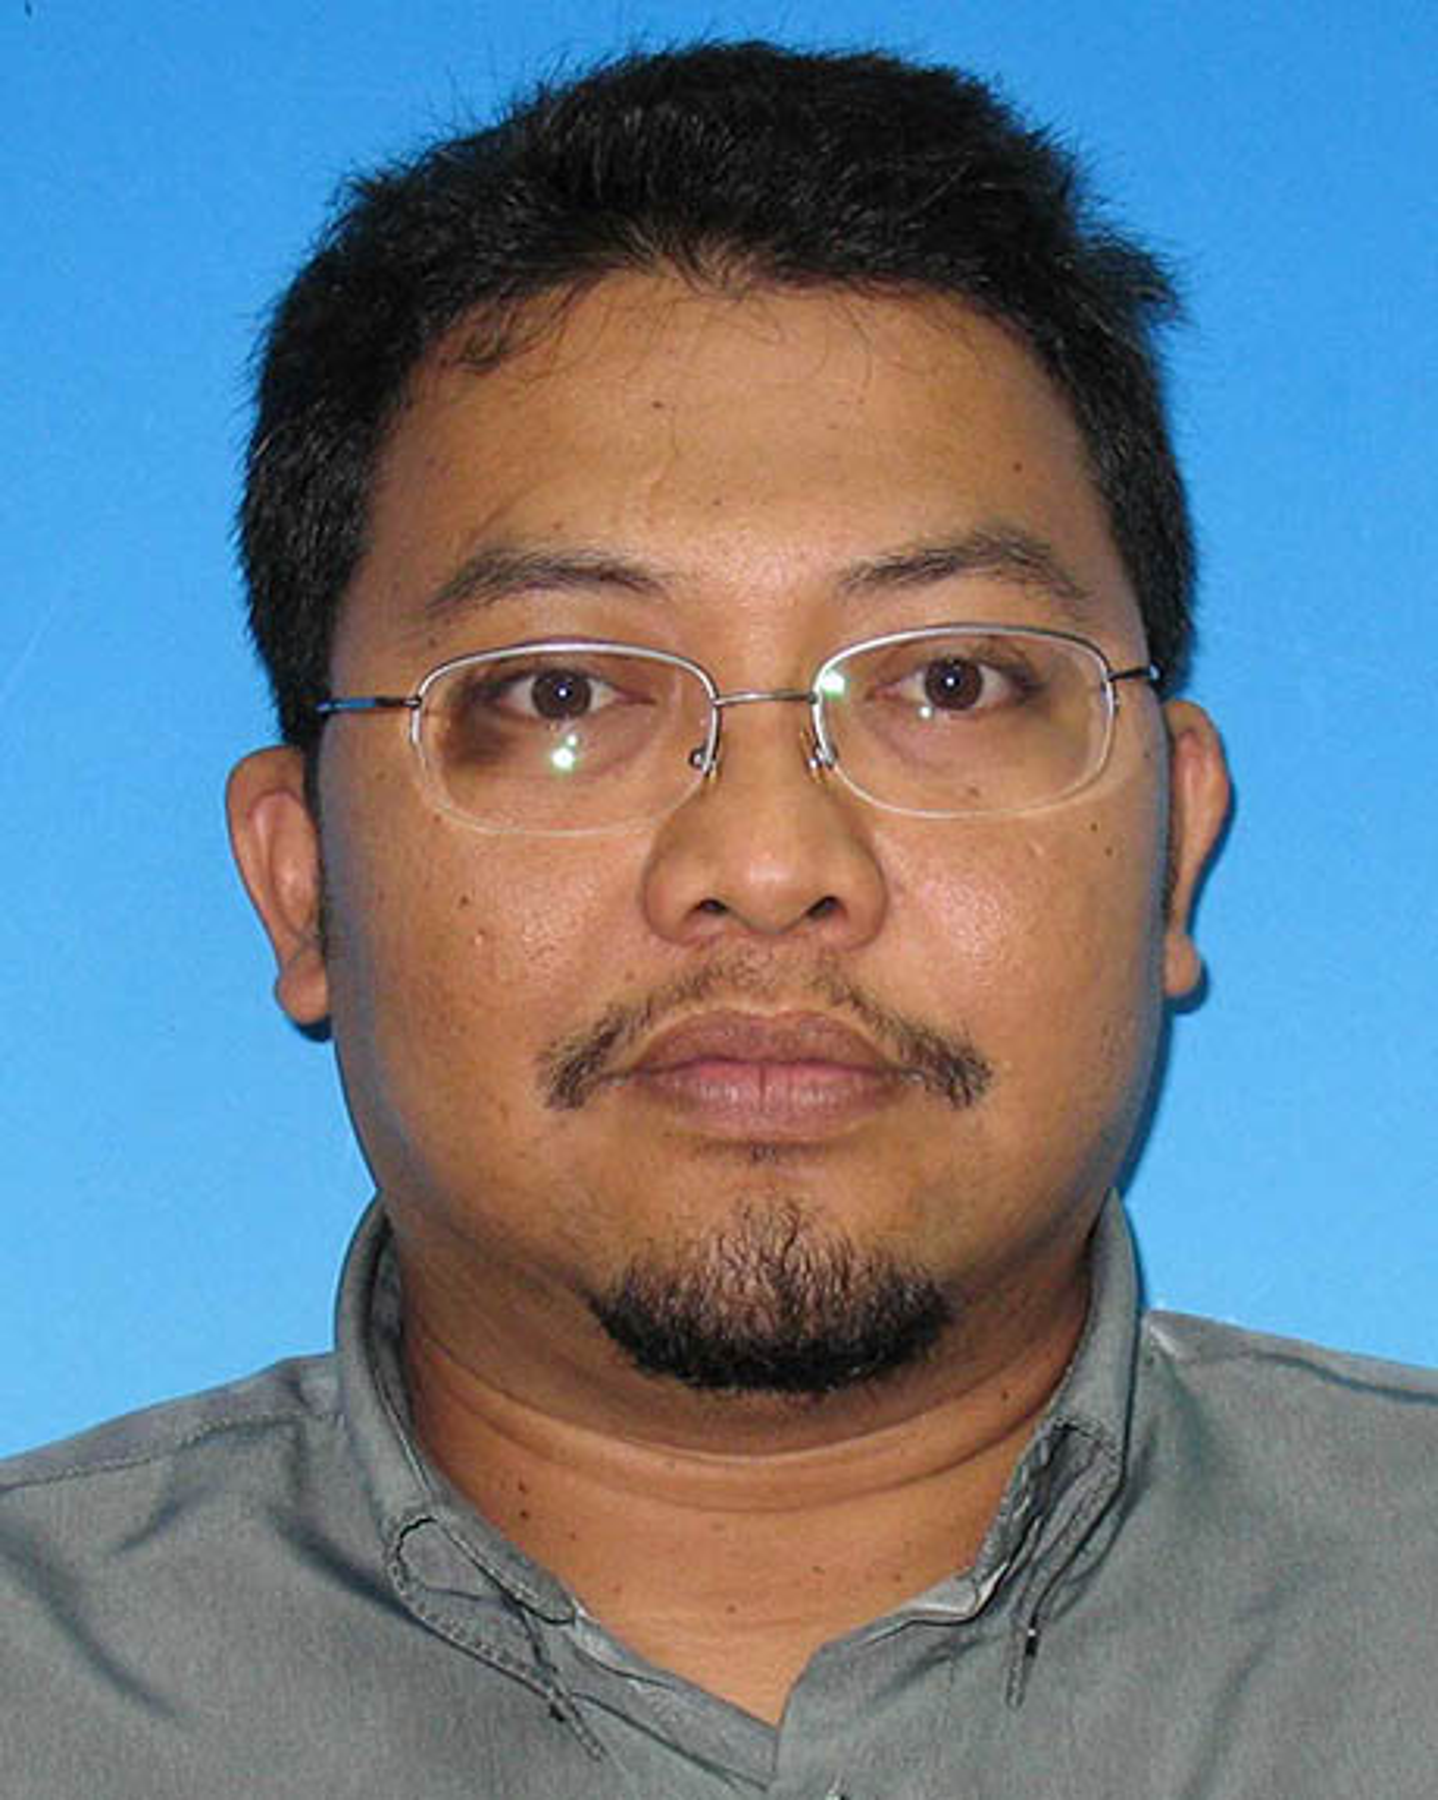 Mohd Zaim Khairi Bin Hj Mohd Kenali